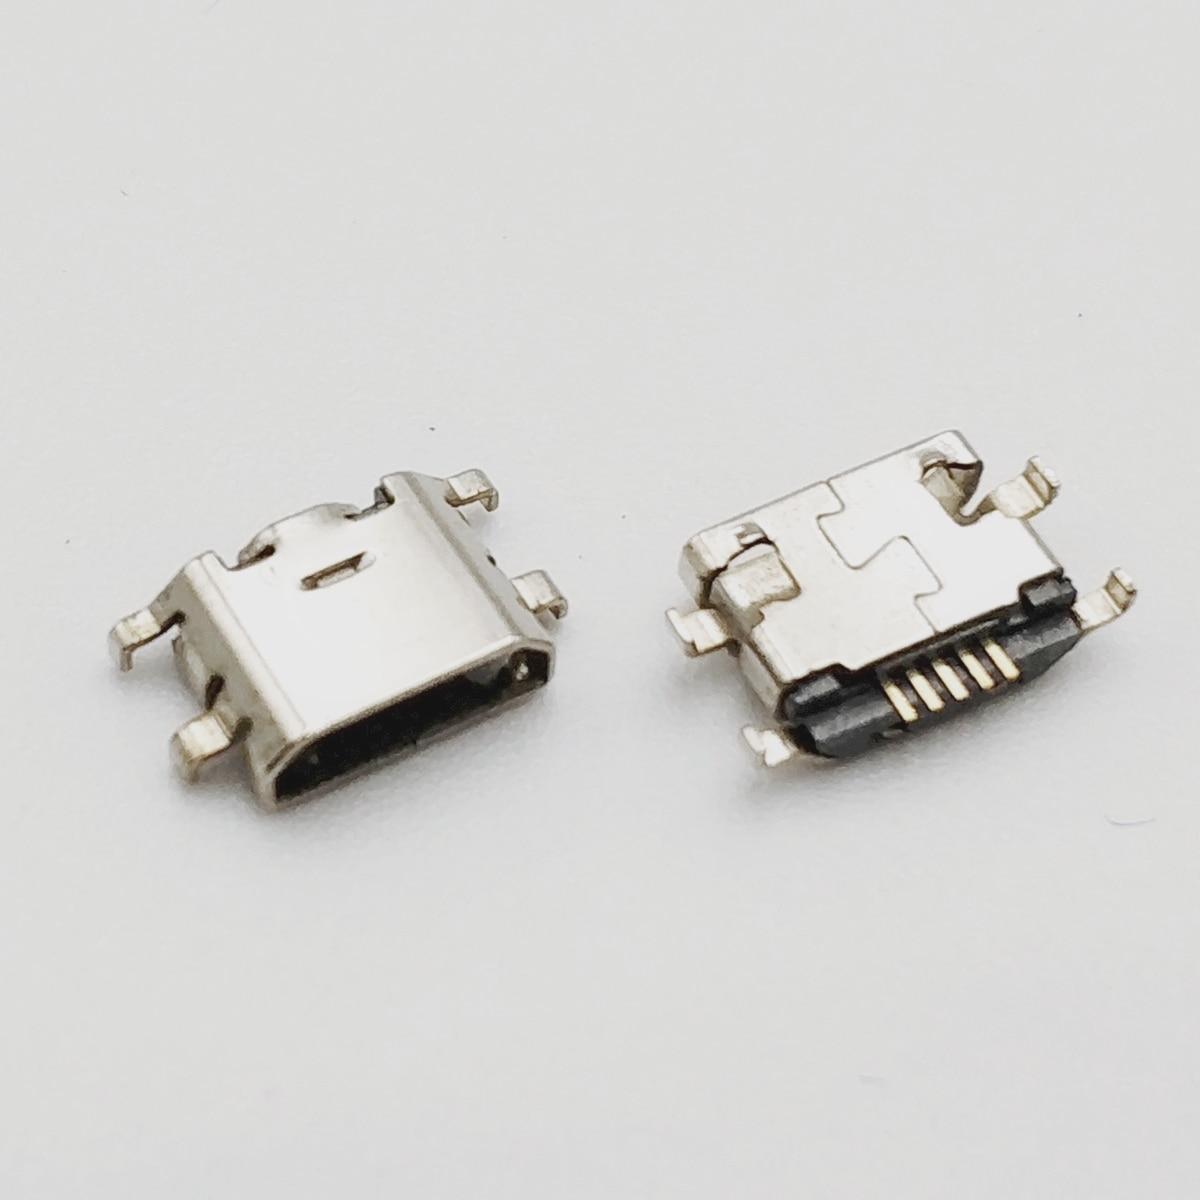 10pcs Micro USB 5pin Mini Connector Reverse Heavy Plate Mobile Charging Port For Xiaomi MAX MI MIX Mobile Phone Repair Parts